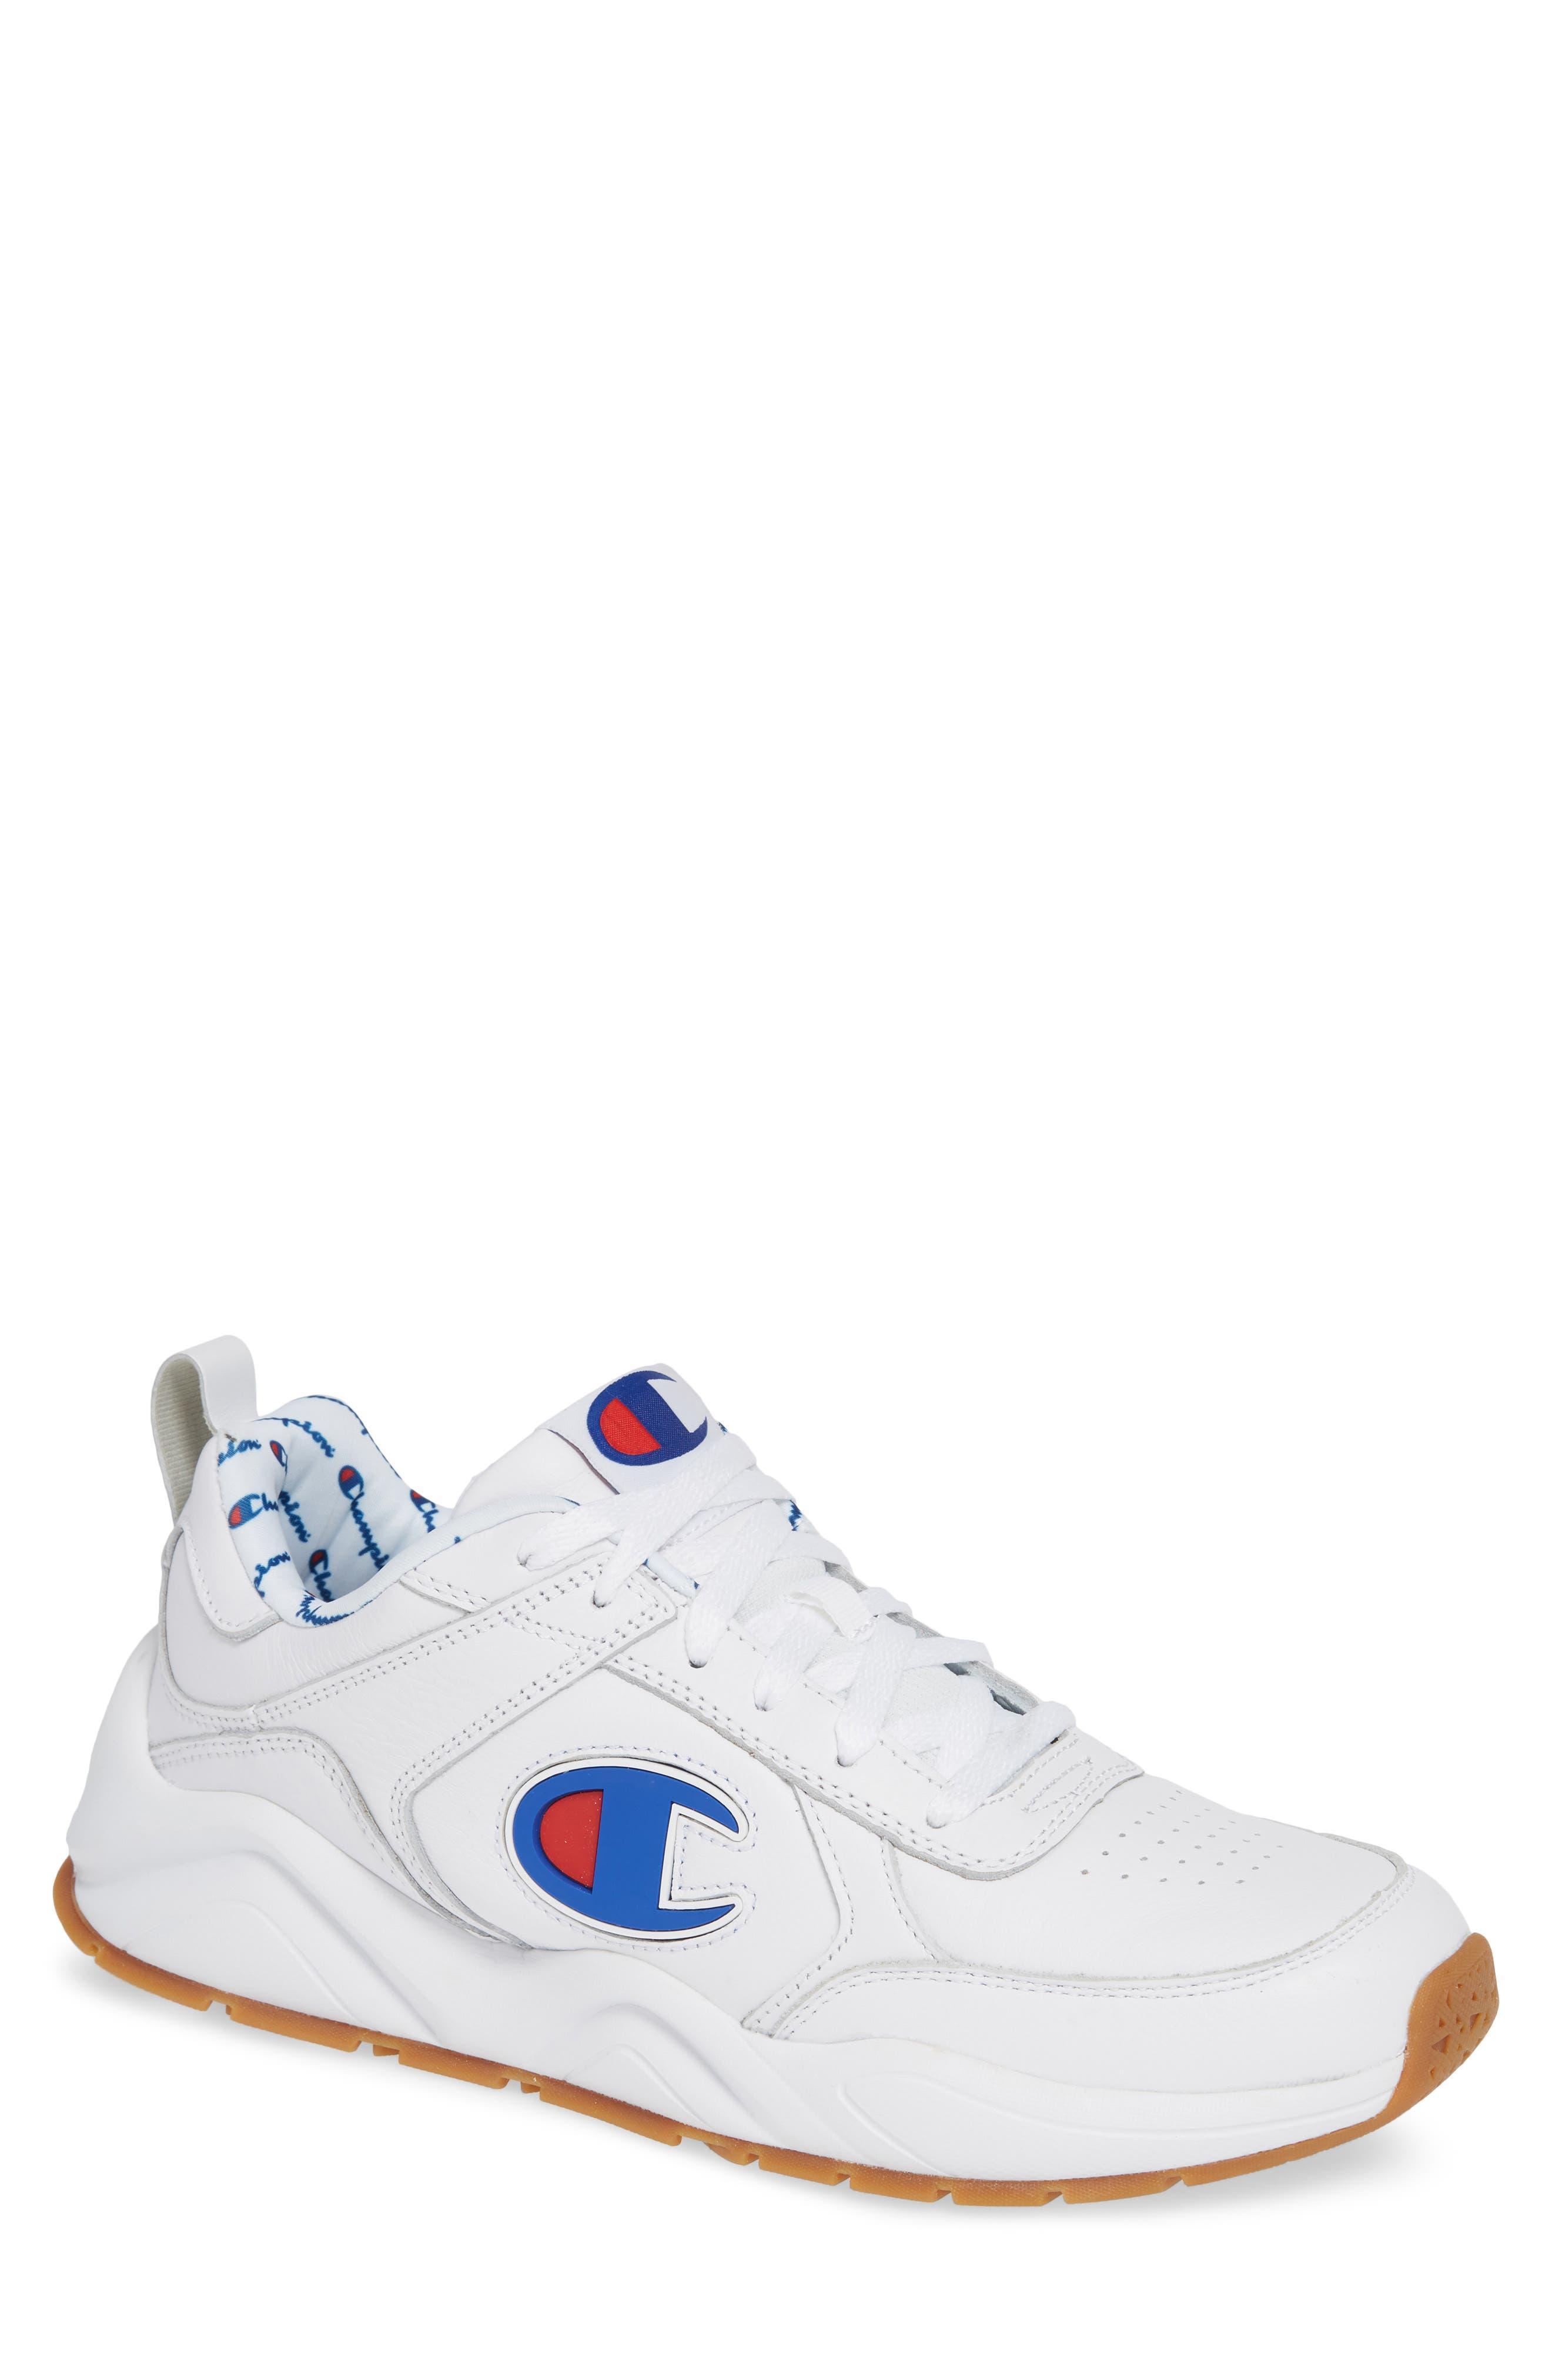 Bones Big-C Sneaker,                             Main thumbnail 1, color,                             WHITE